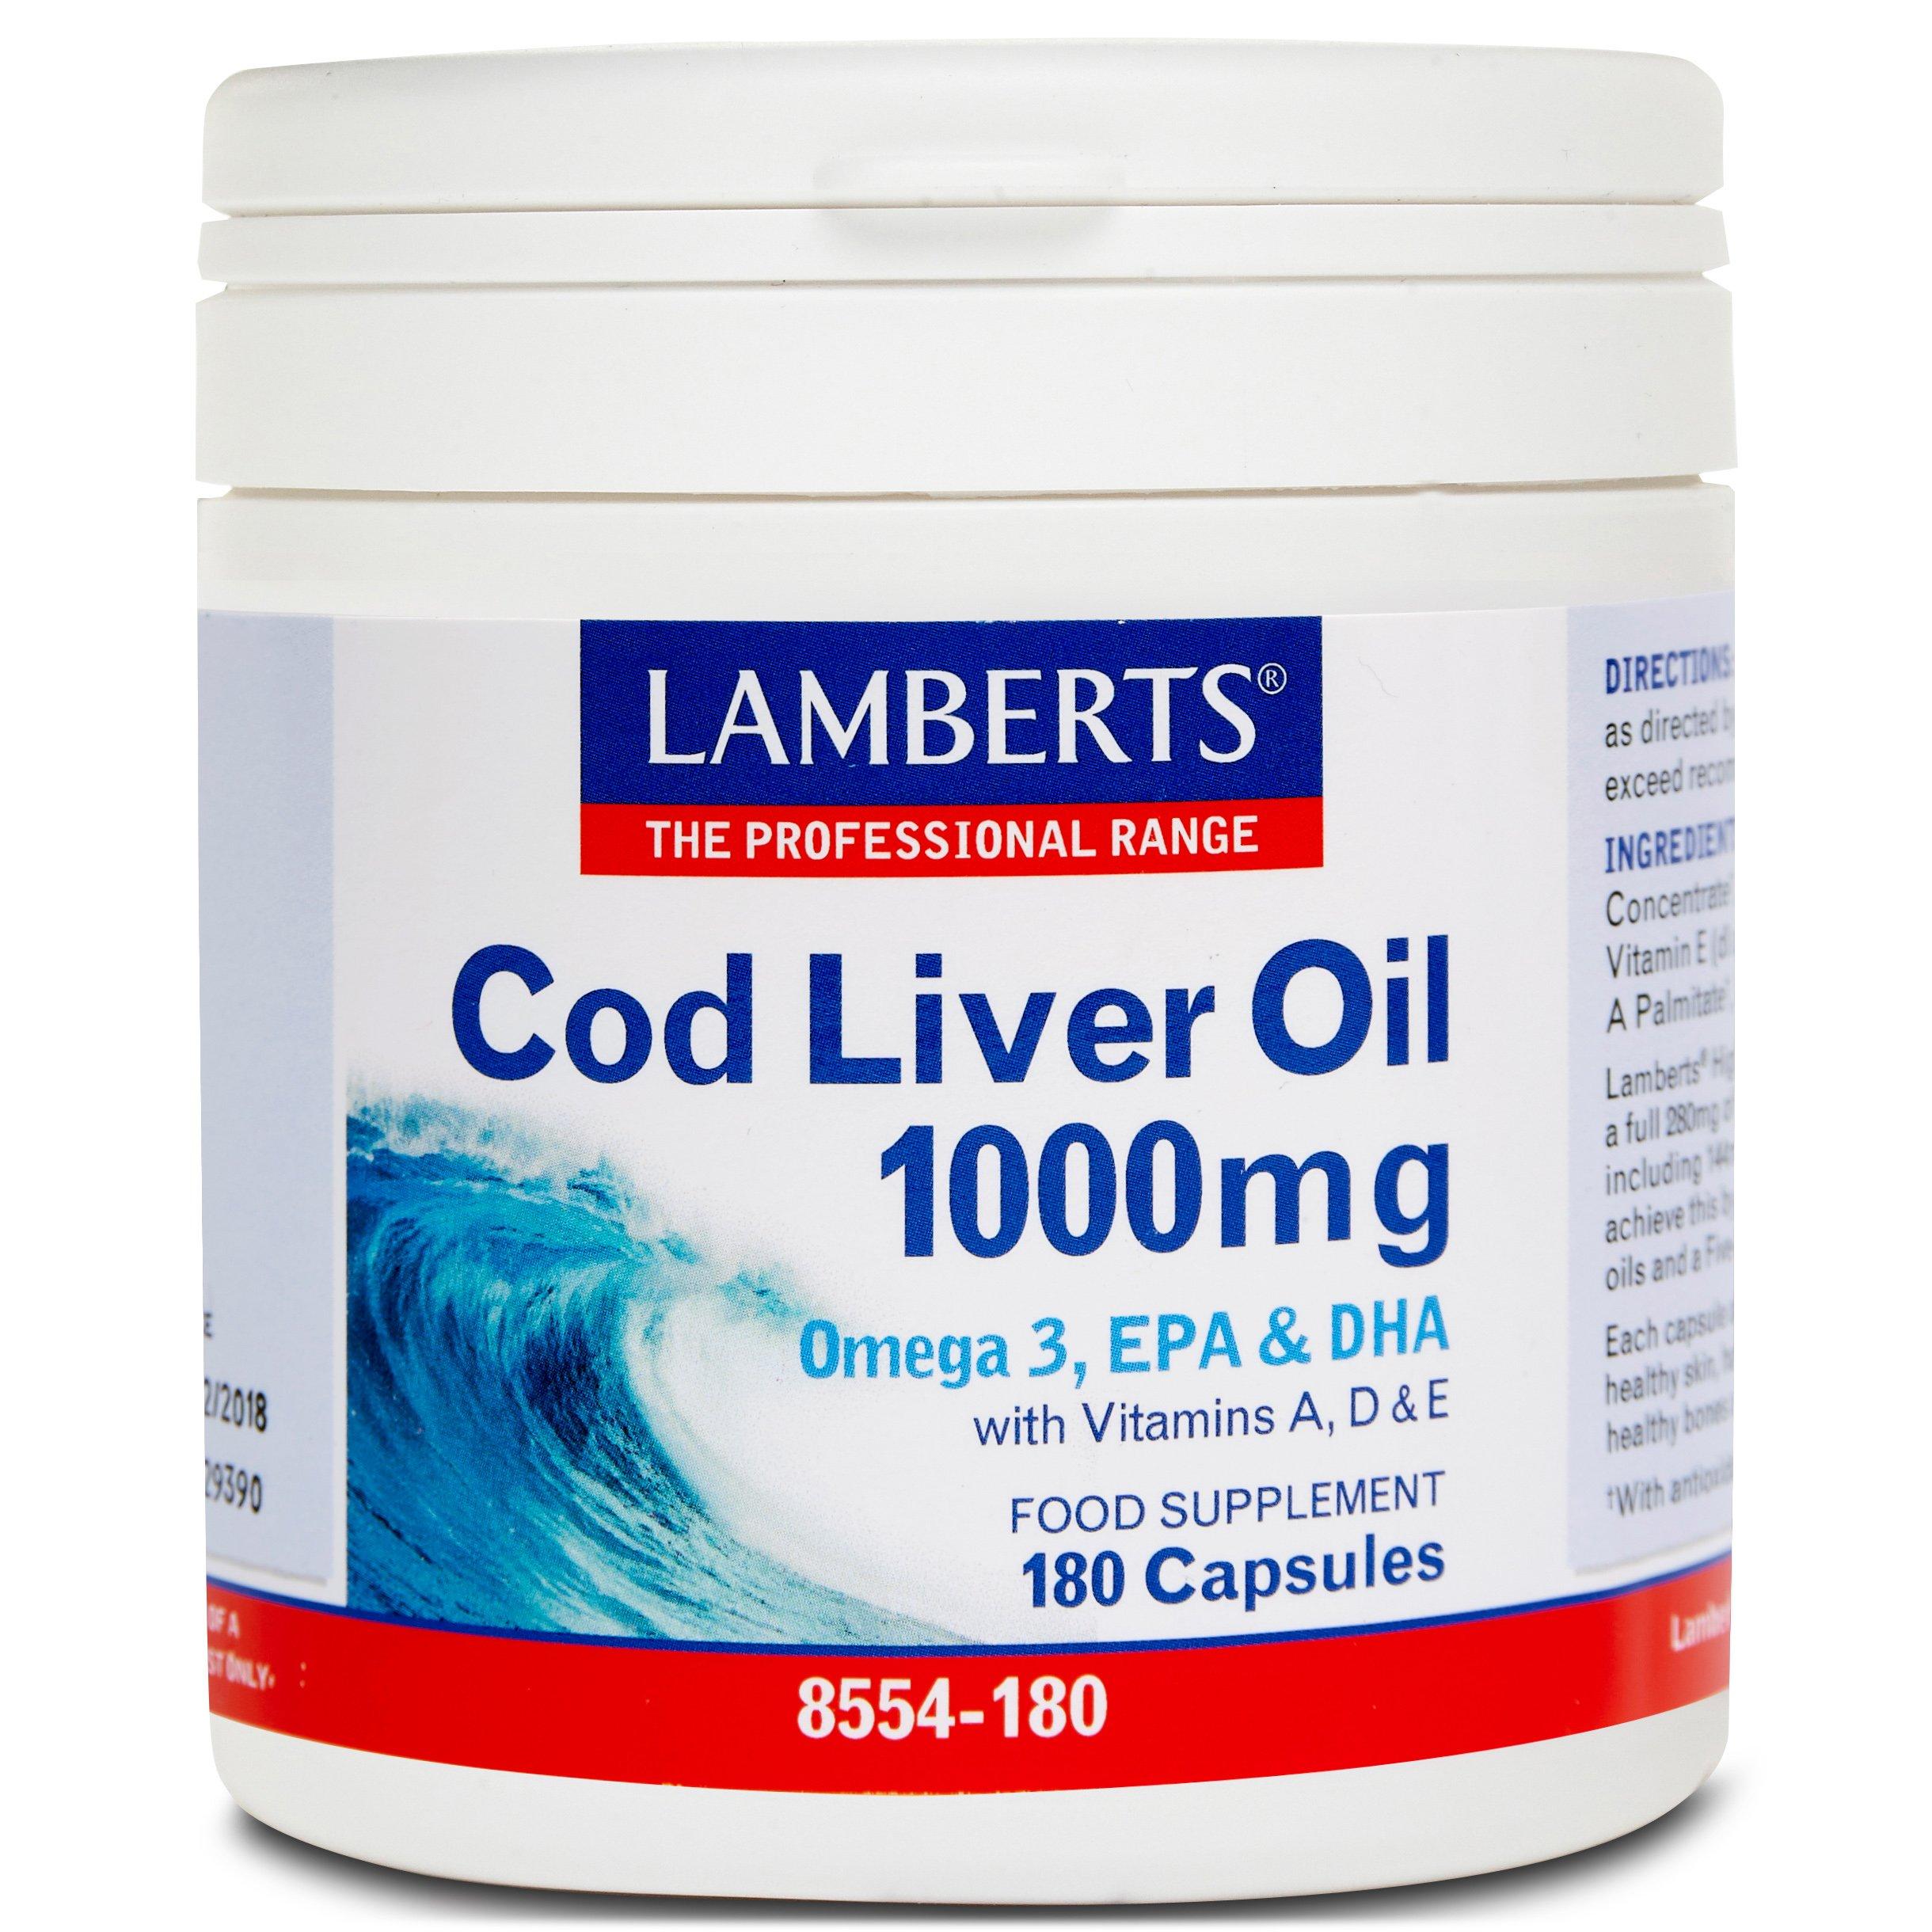 Lambers Cod Liver Oil Συμπλήρωμα Διατροφής μεΩμέγα 3 Λιπαρά Οξέα1000mg 180tabs